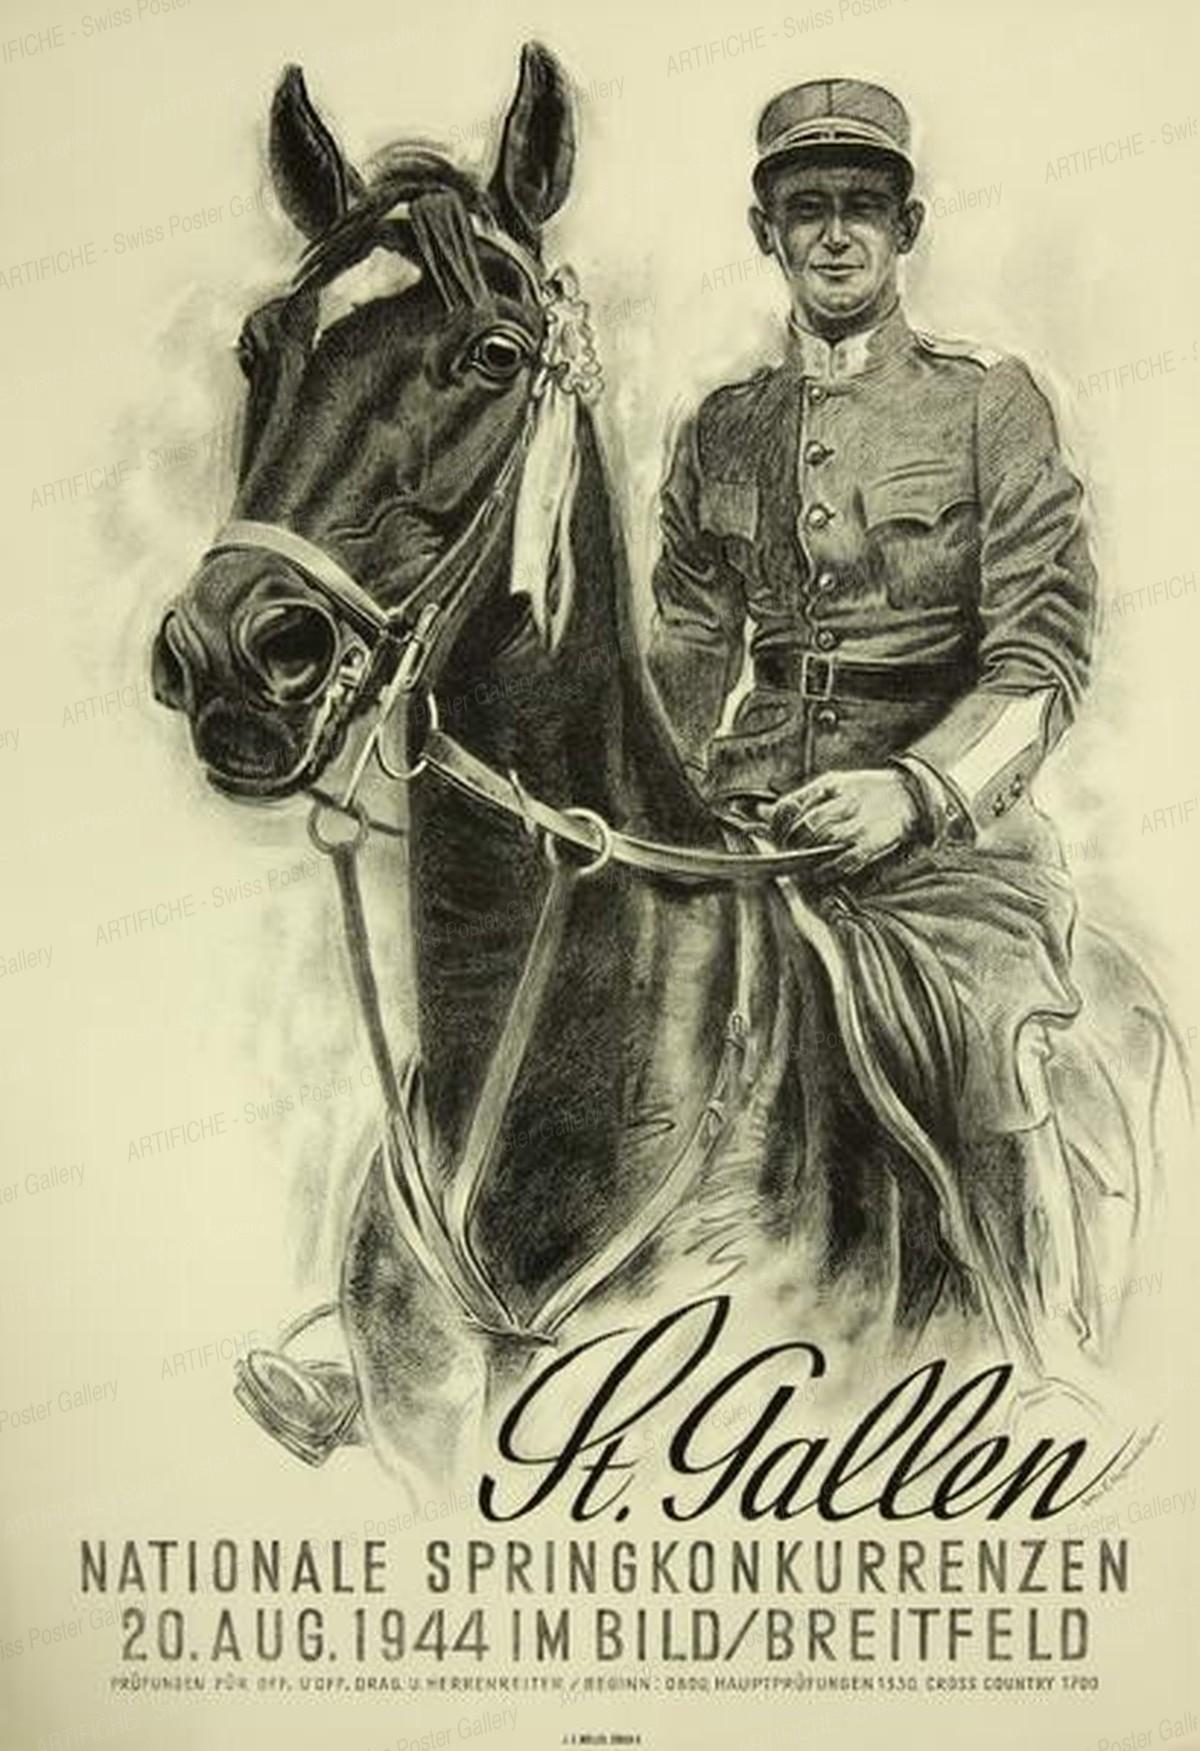 Concours hippique – Horse race St. Gallen, Iwan Edwin Hugentobler